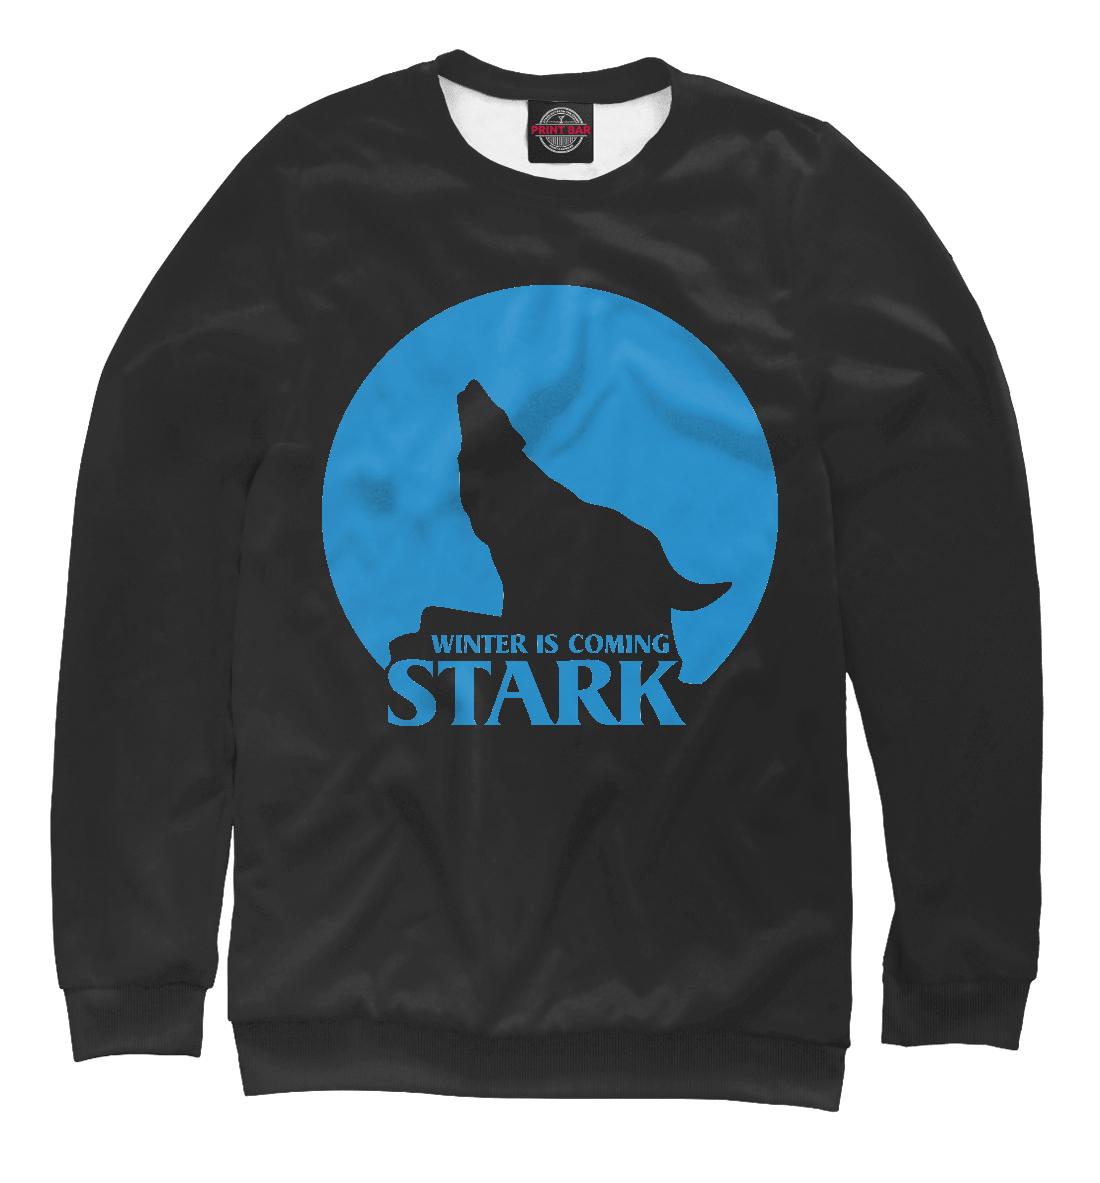 Купить Winter is Coming - Stark, Printbar, Свитшоты, IGR-602197-swi-2